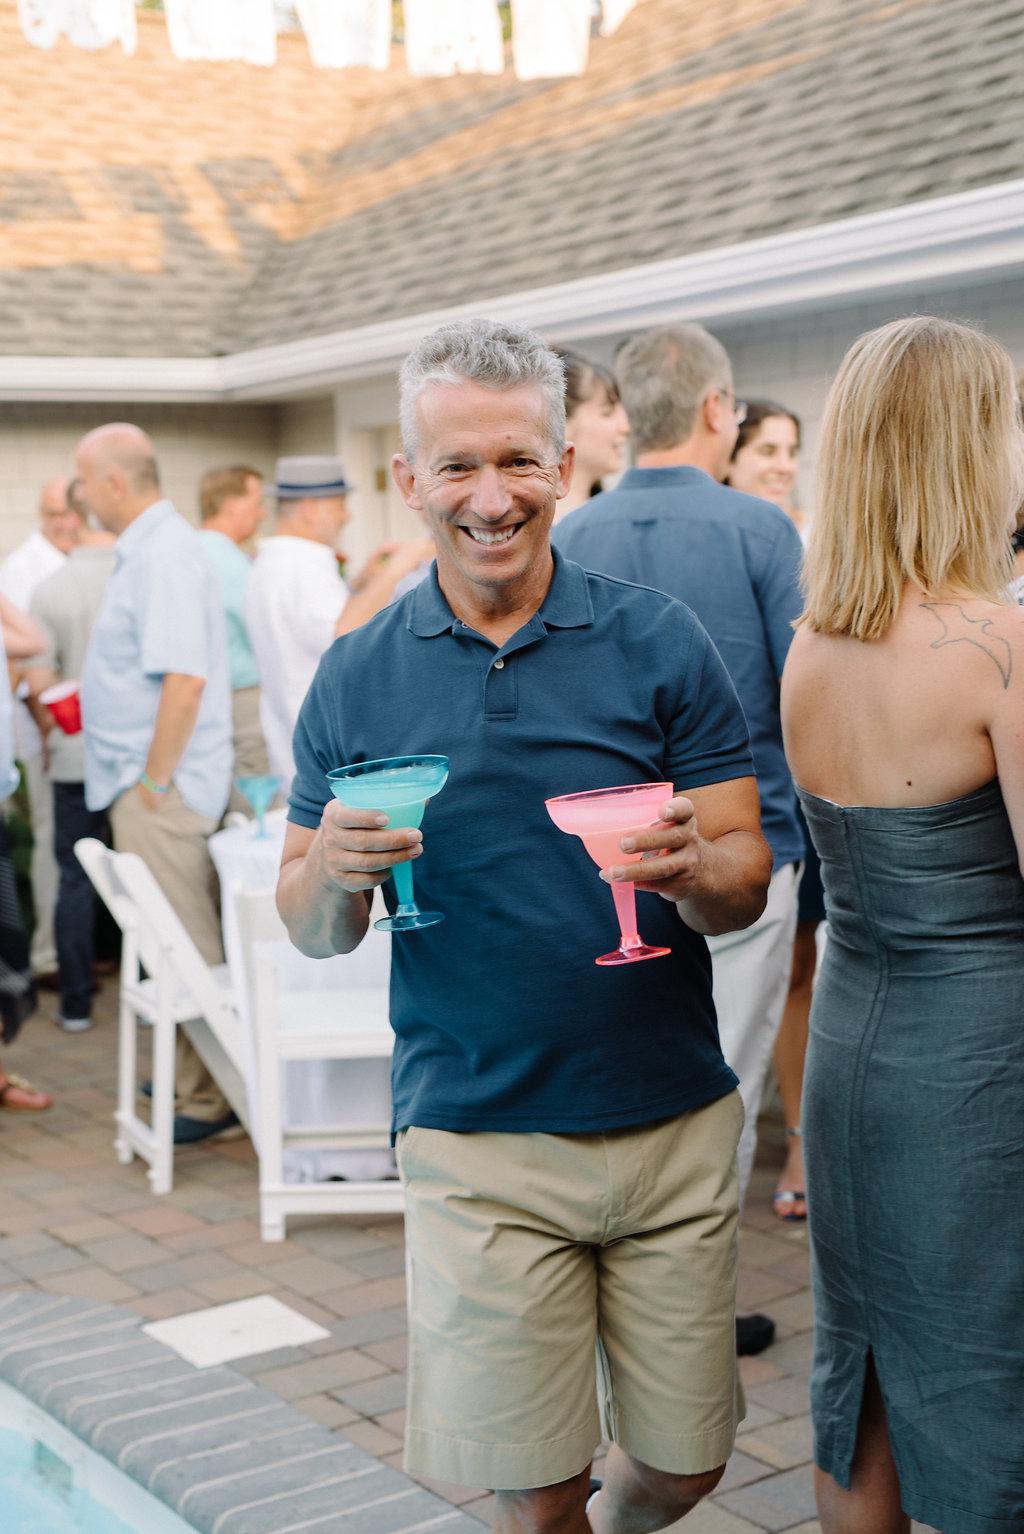 FiestaThemedEngagementParty-Nicole+Mike-SeaGirt-NewJersey-OliviaChristinaPhoto-125.jpg